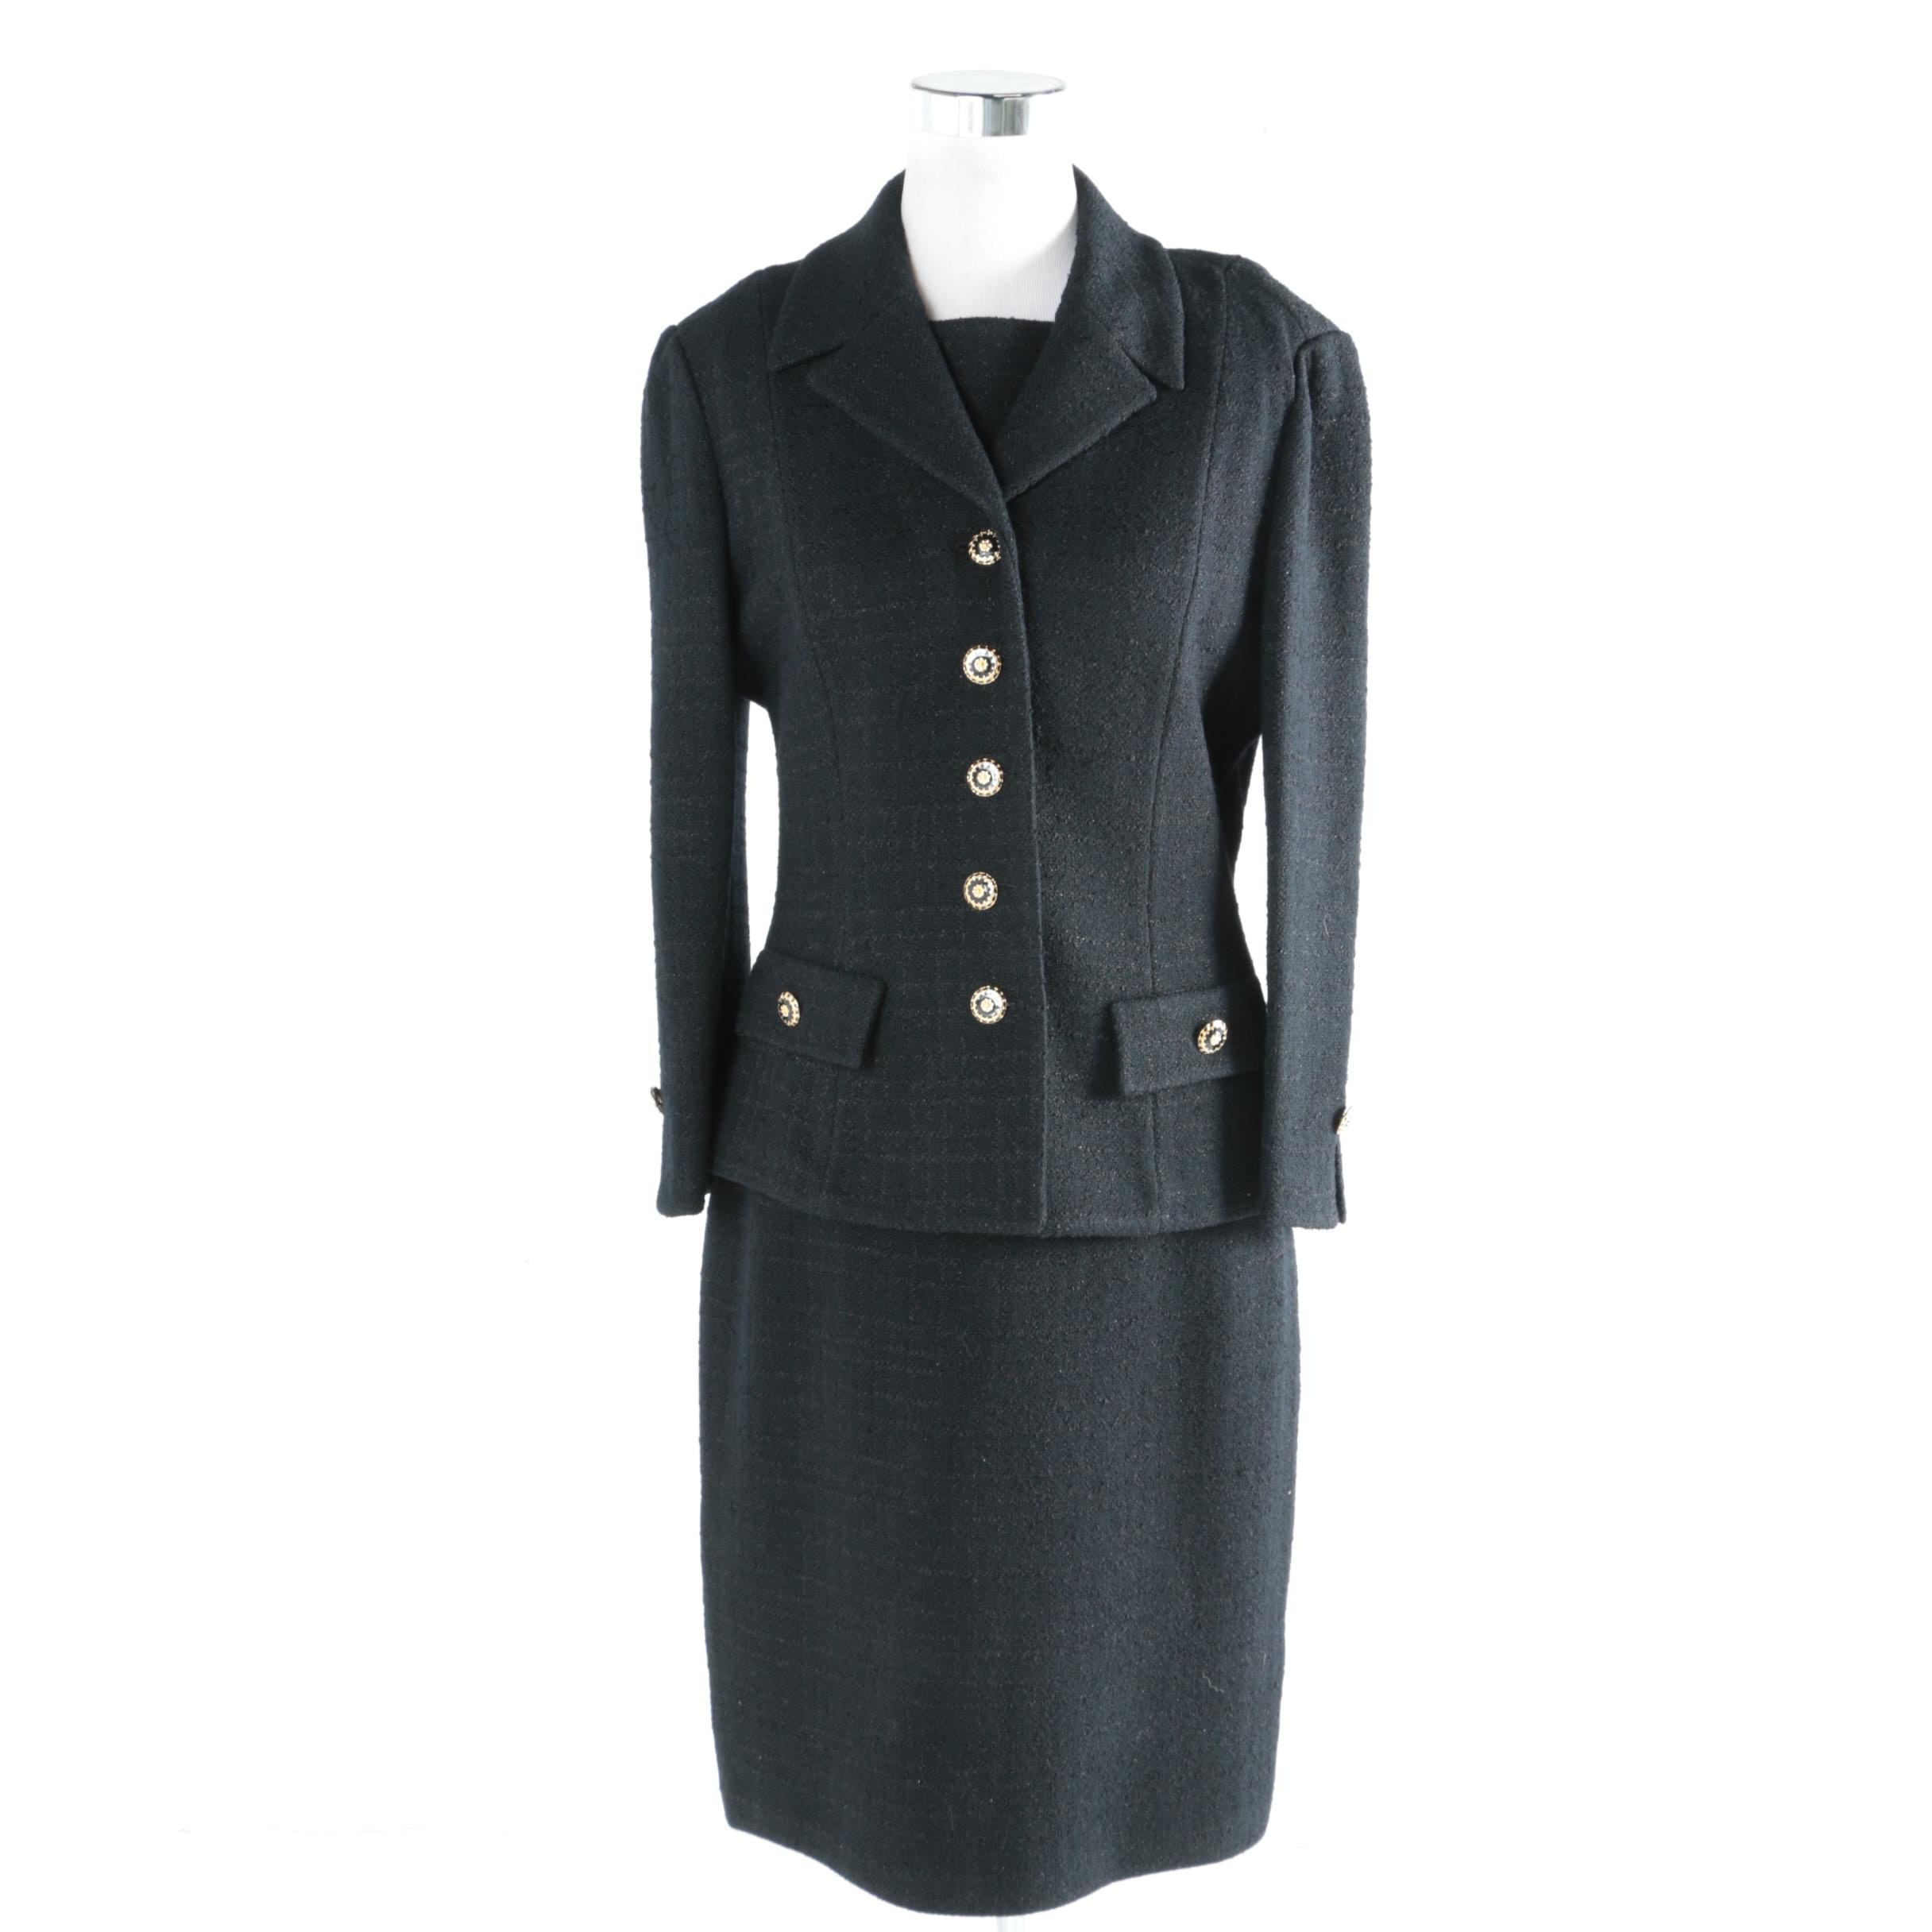 St. John Collection Dress Set